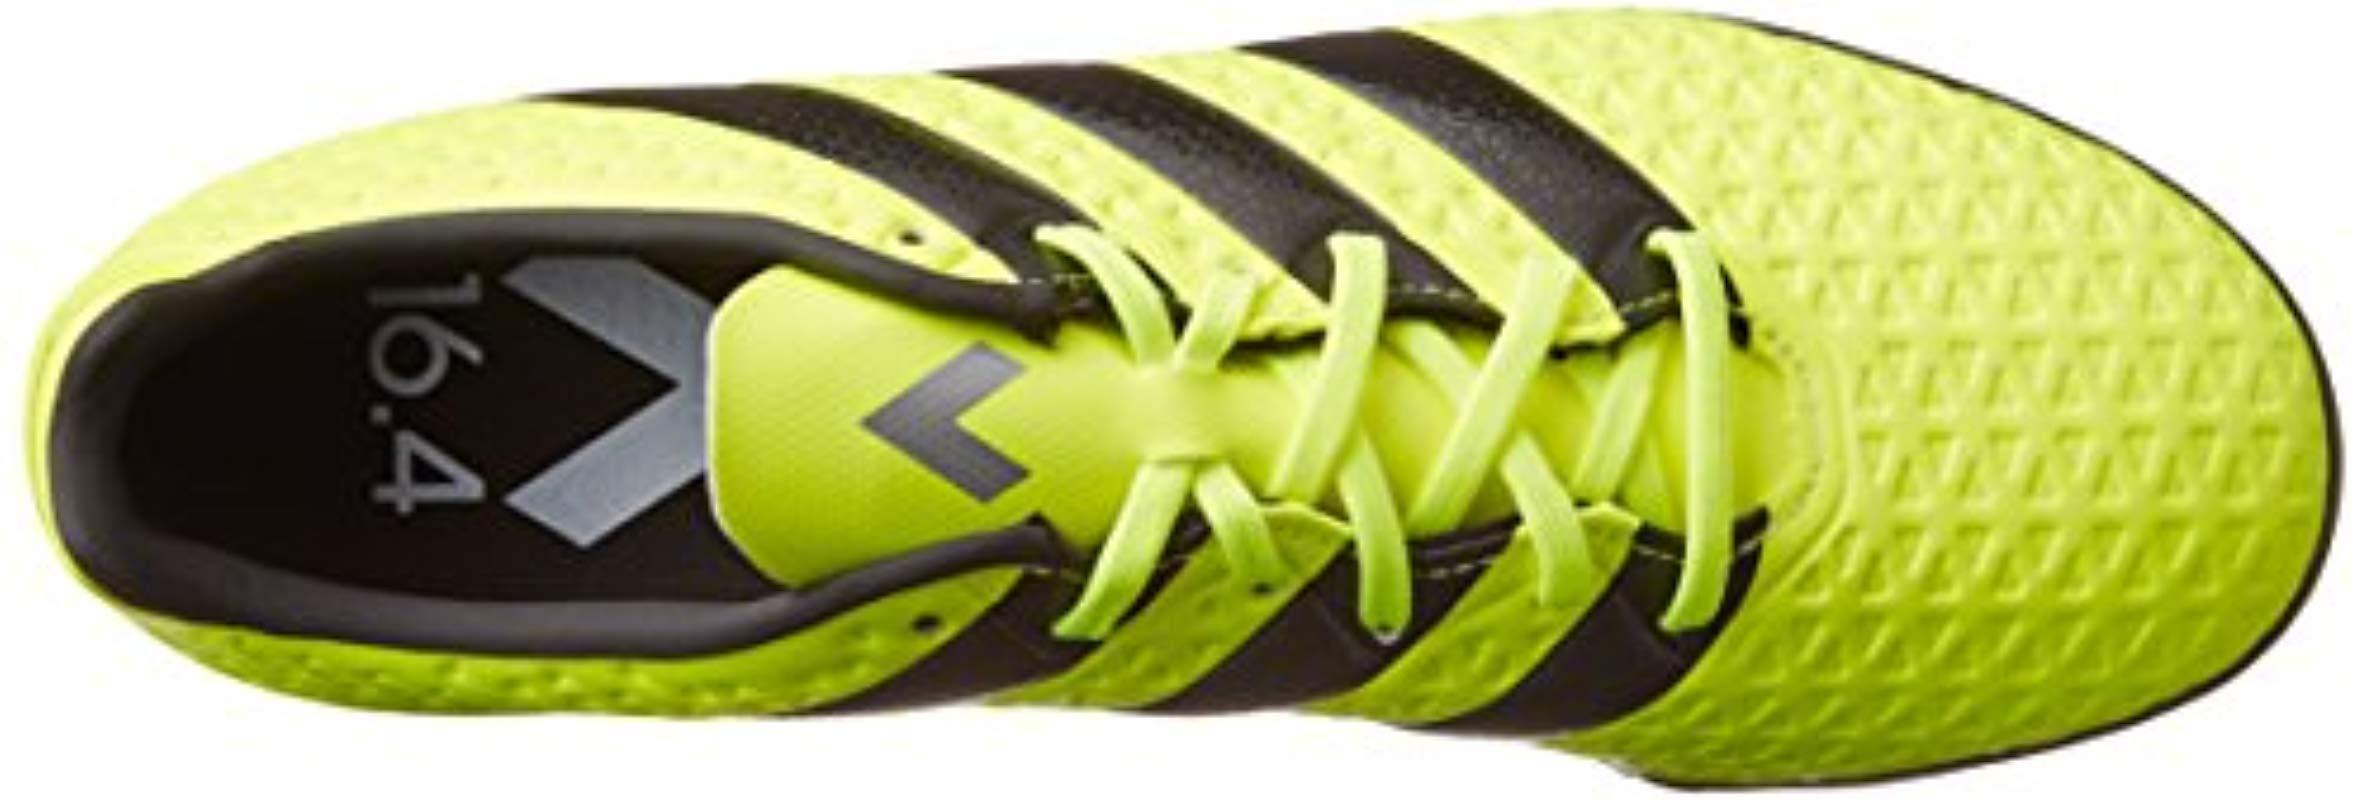 Ace 16.4 TF, Botas de fútbol para Hombre adidas de hombre de color Amarillo